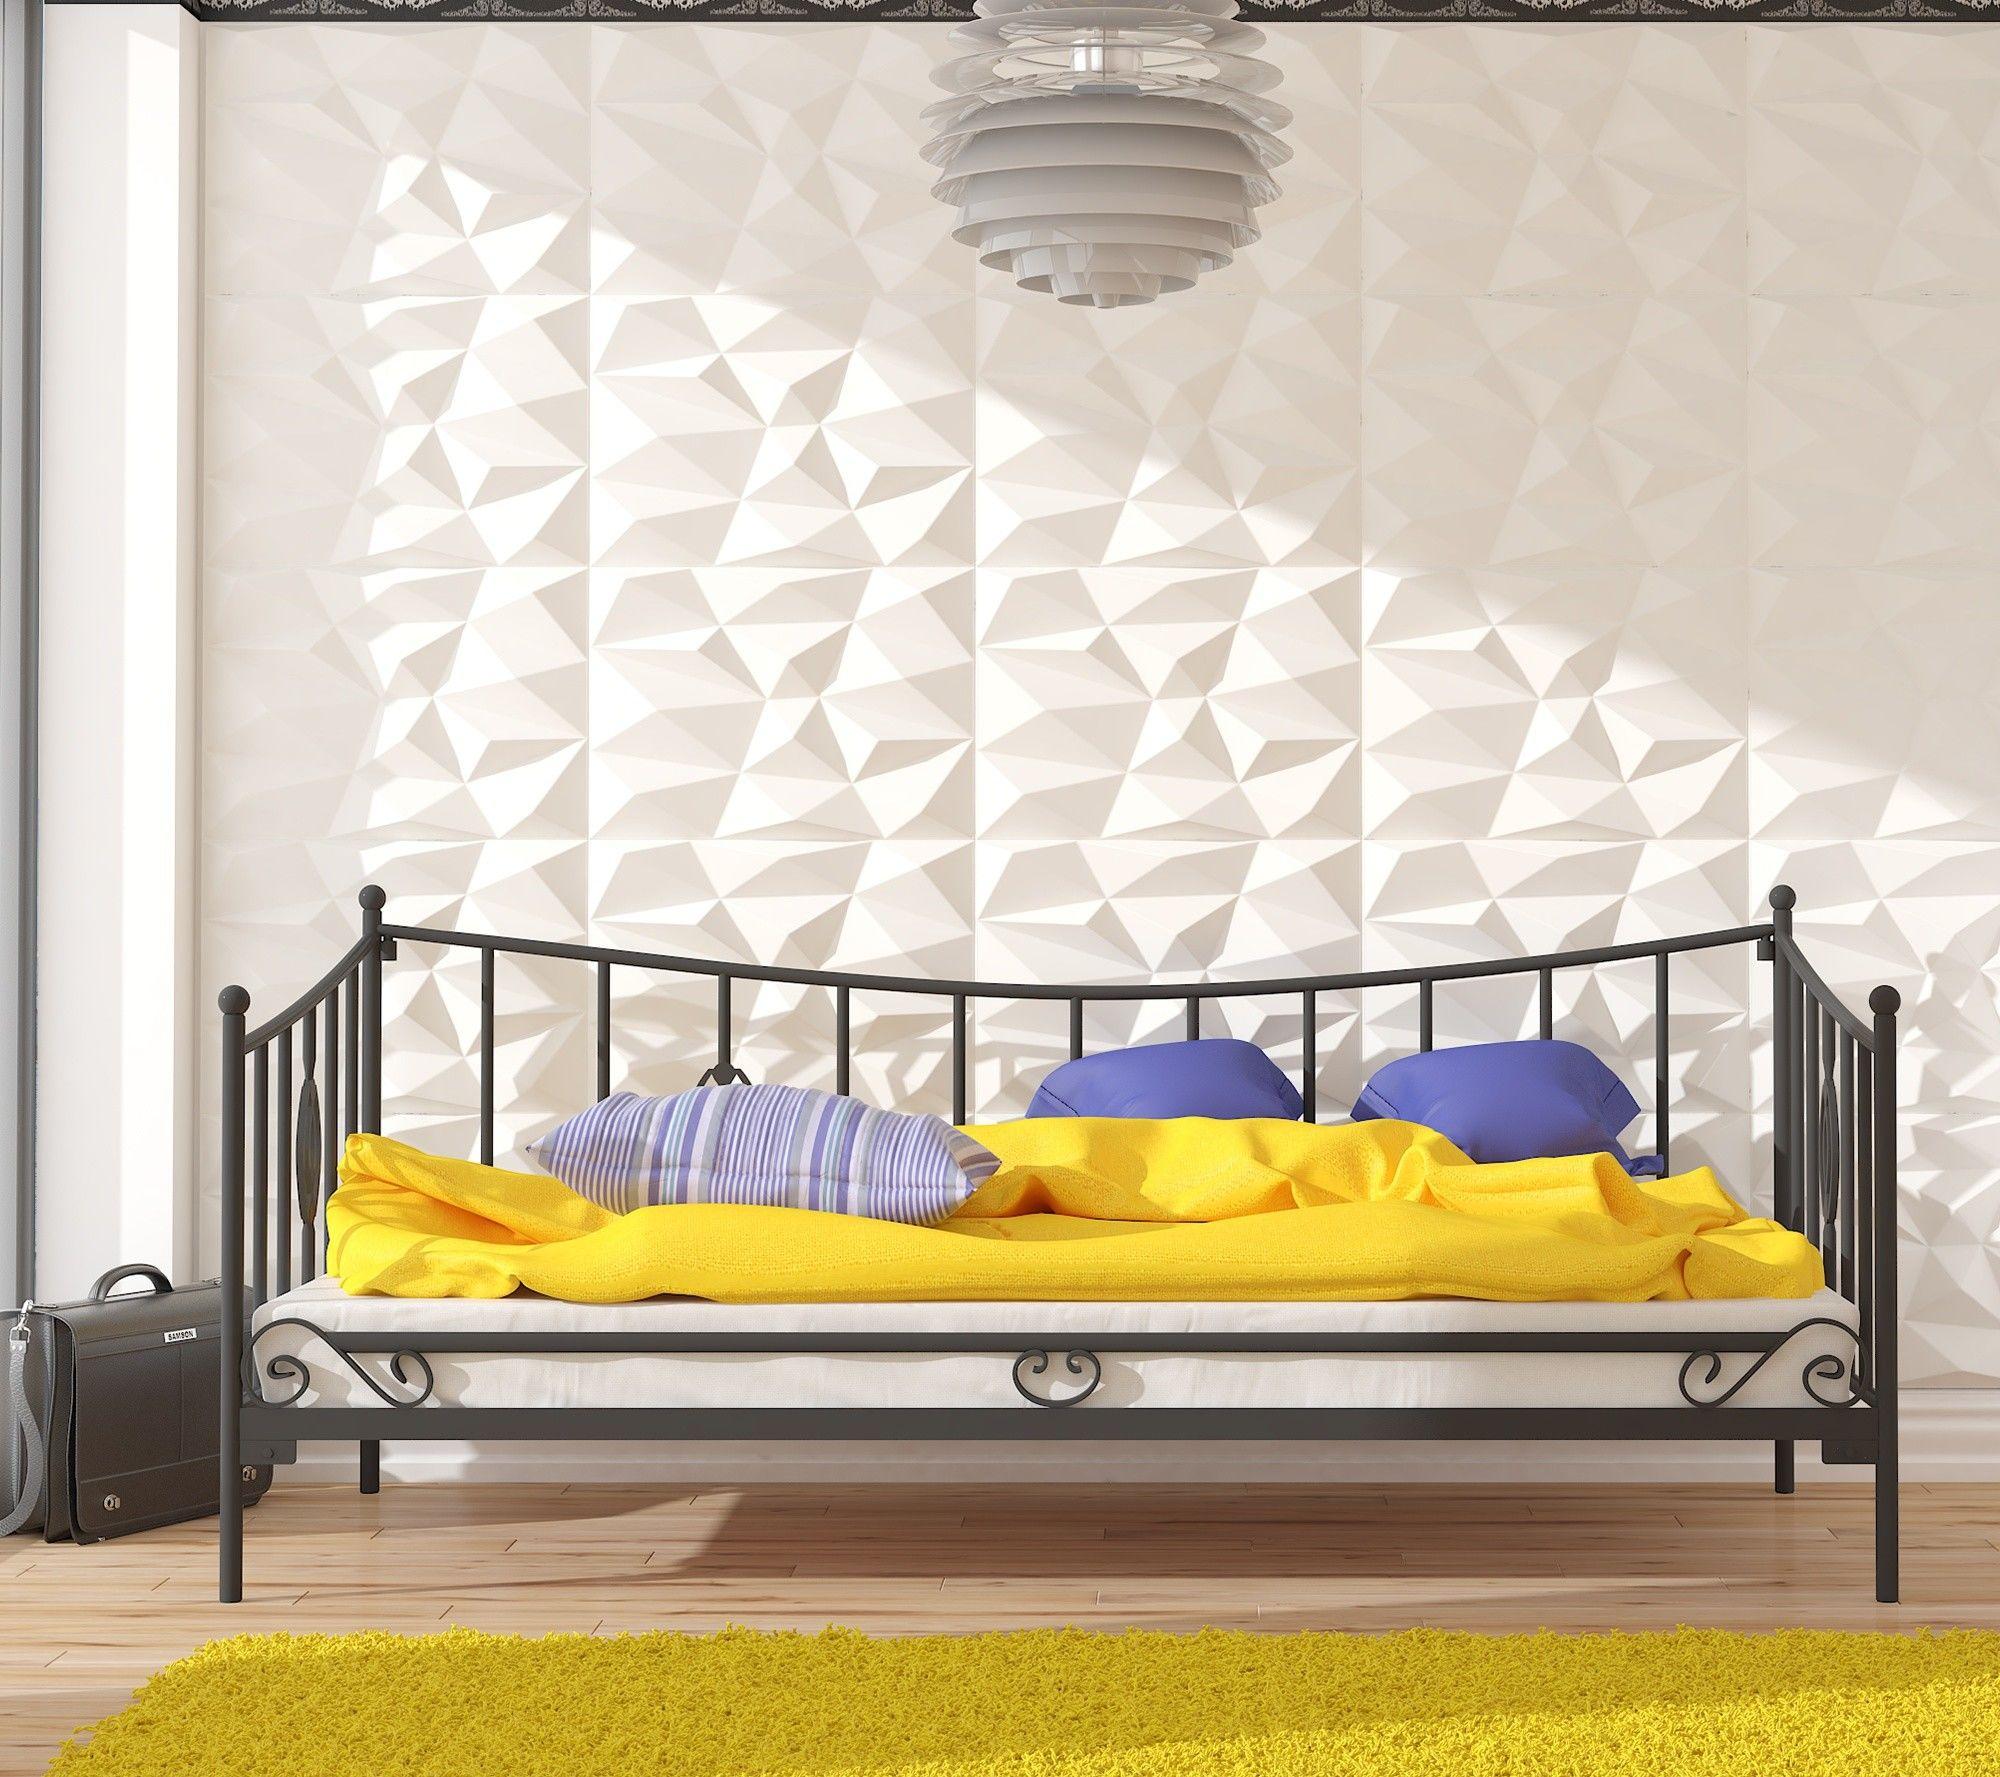 Łóżko metalowe sofa Lak System wzór 31 ze stelażem